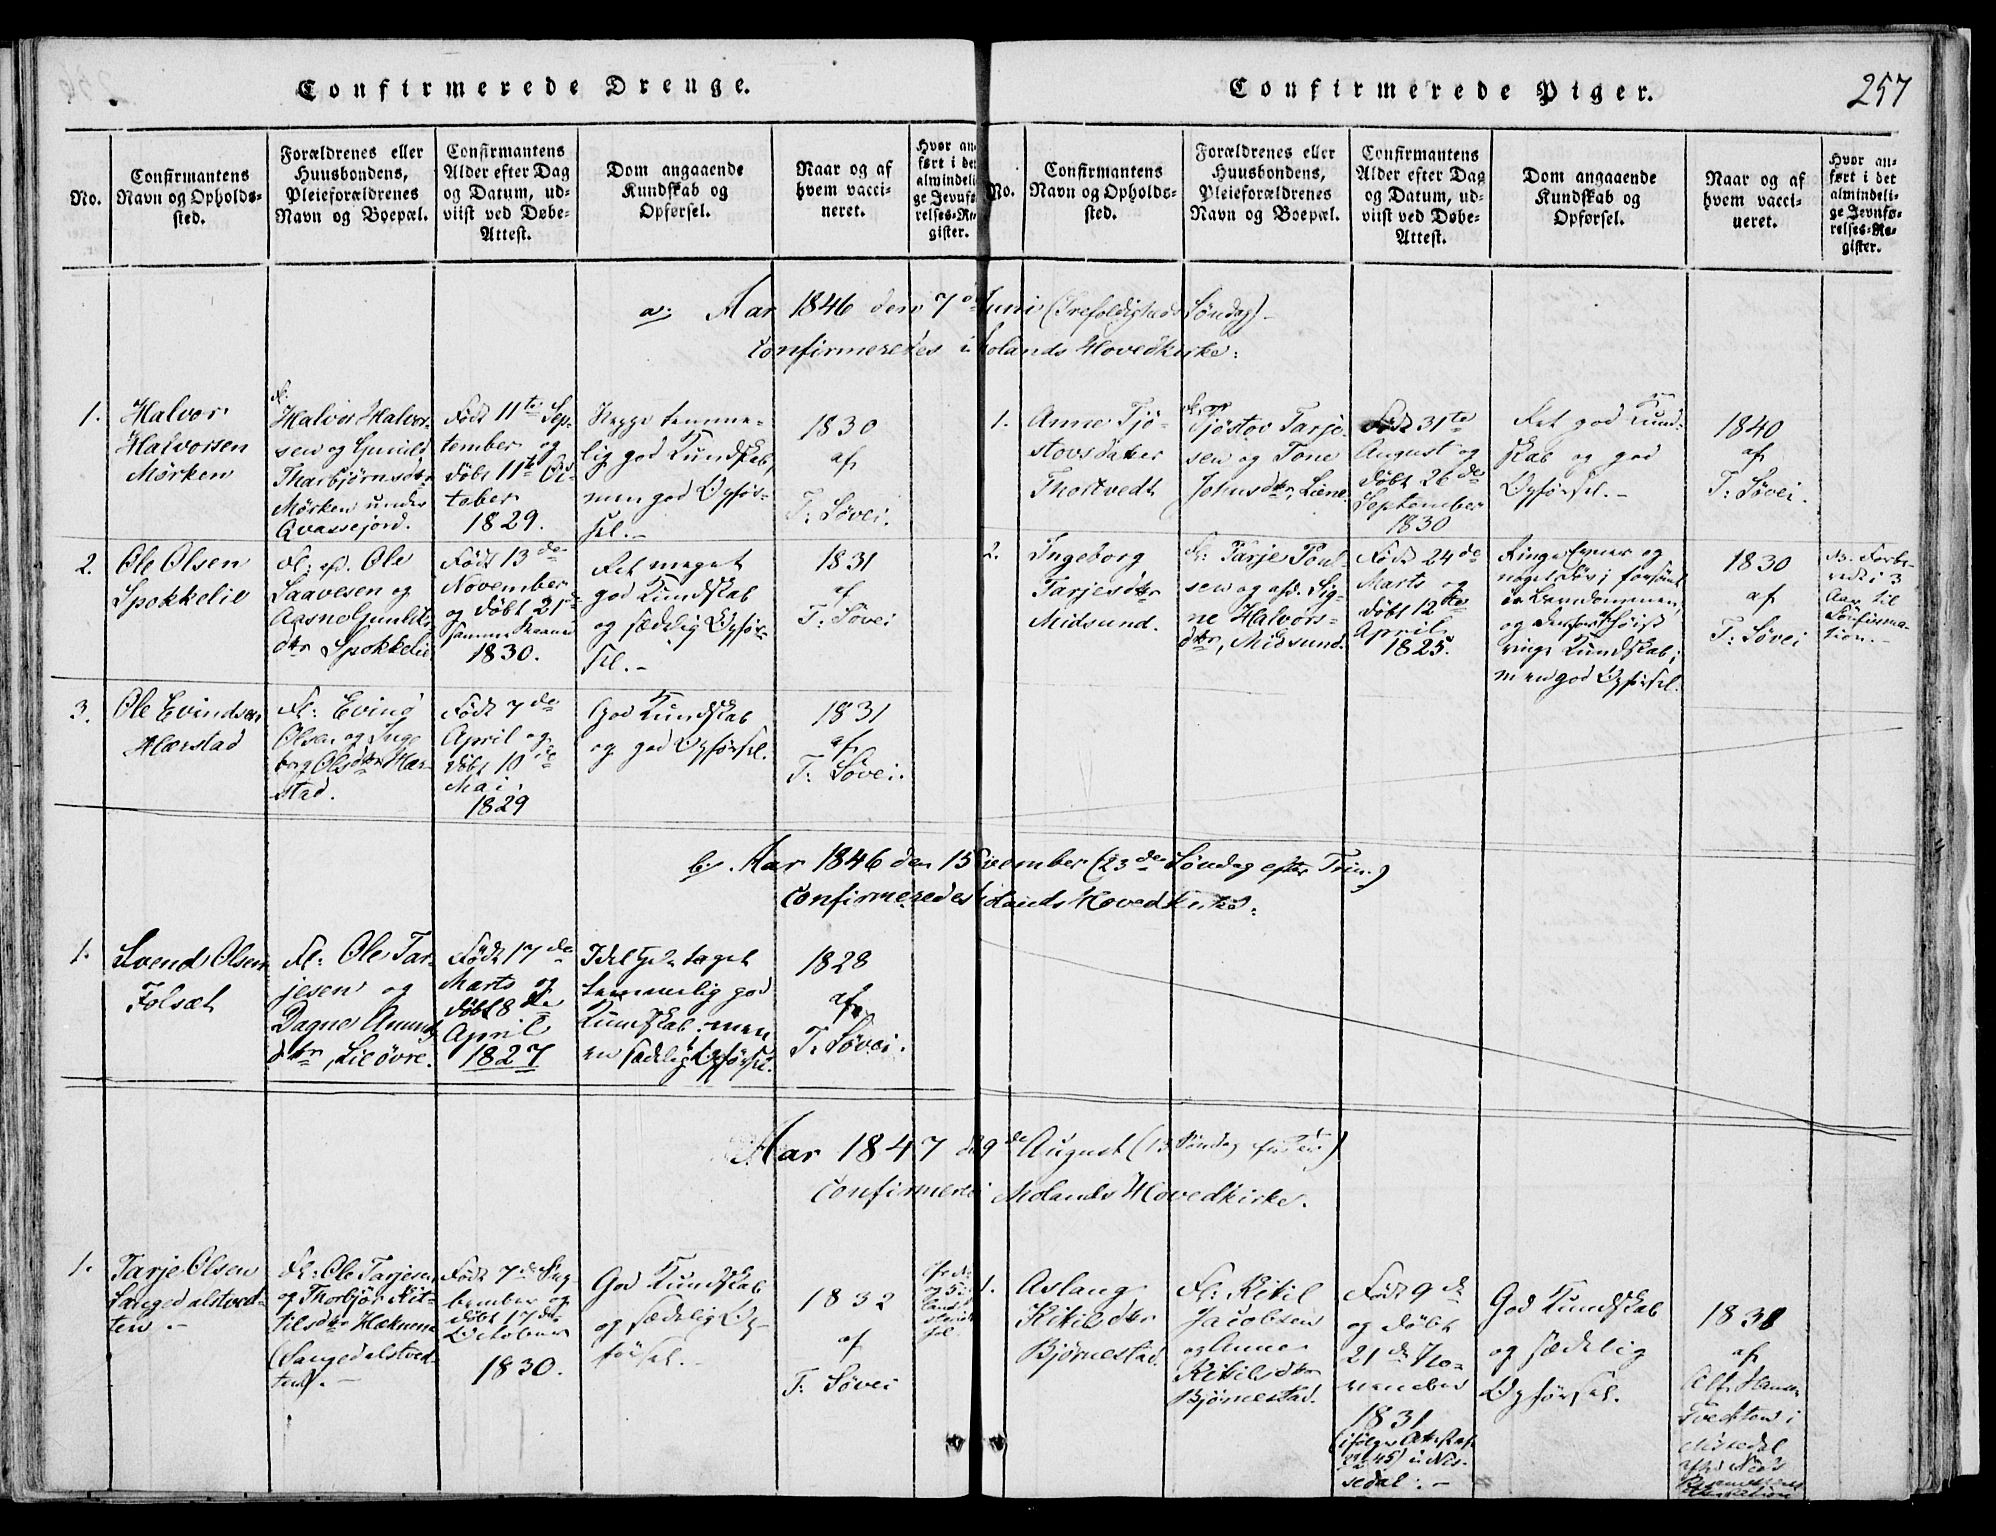 SAKO, Fyresdal kirkebøker, F/Fb/L0001: Ministerialbok nr. II 1, 1815-1854, s. 257